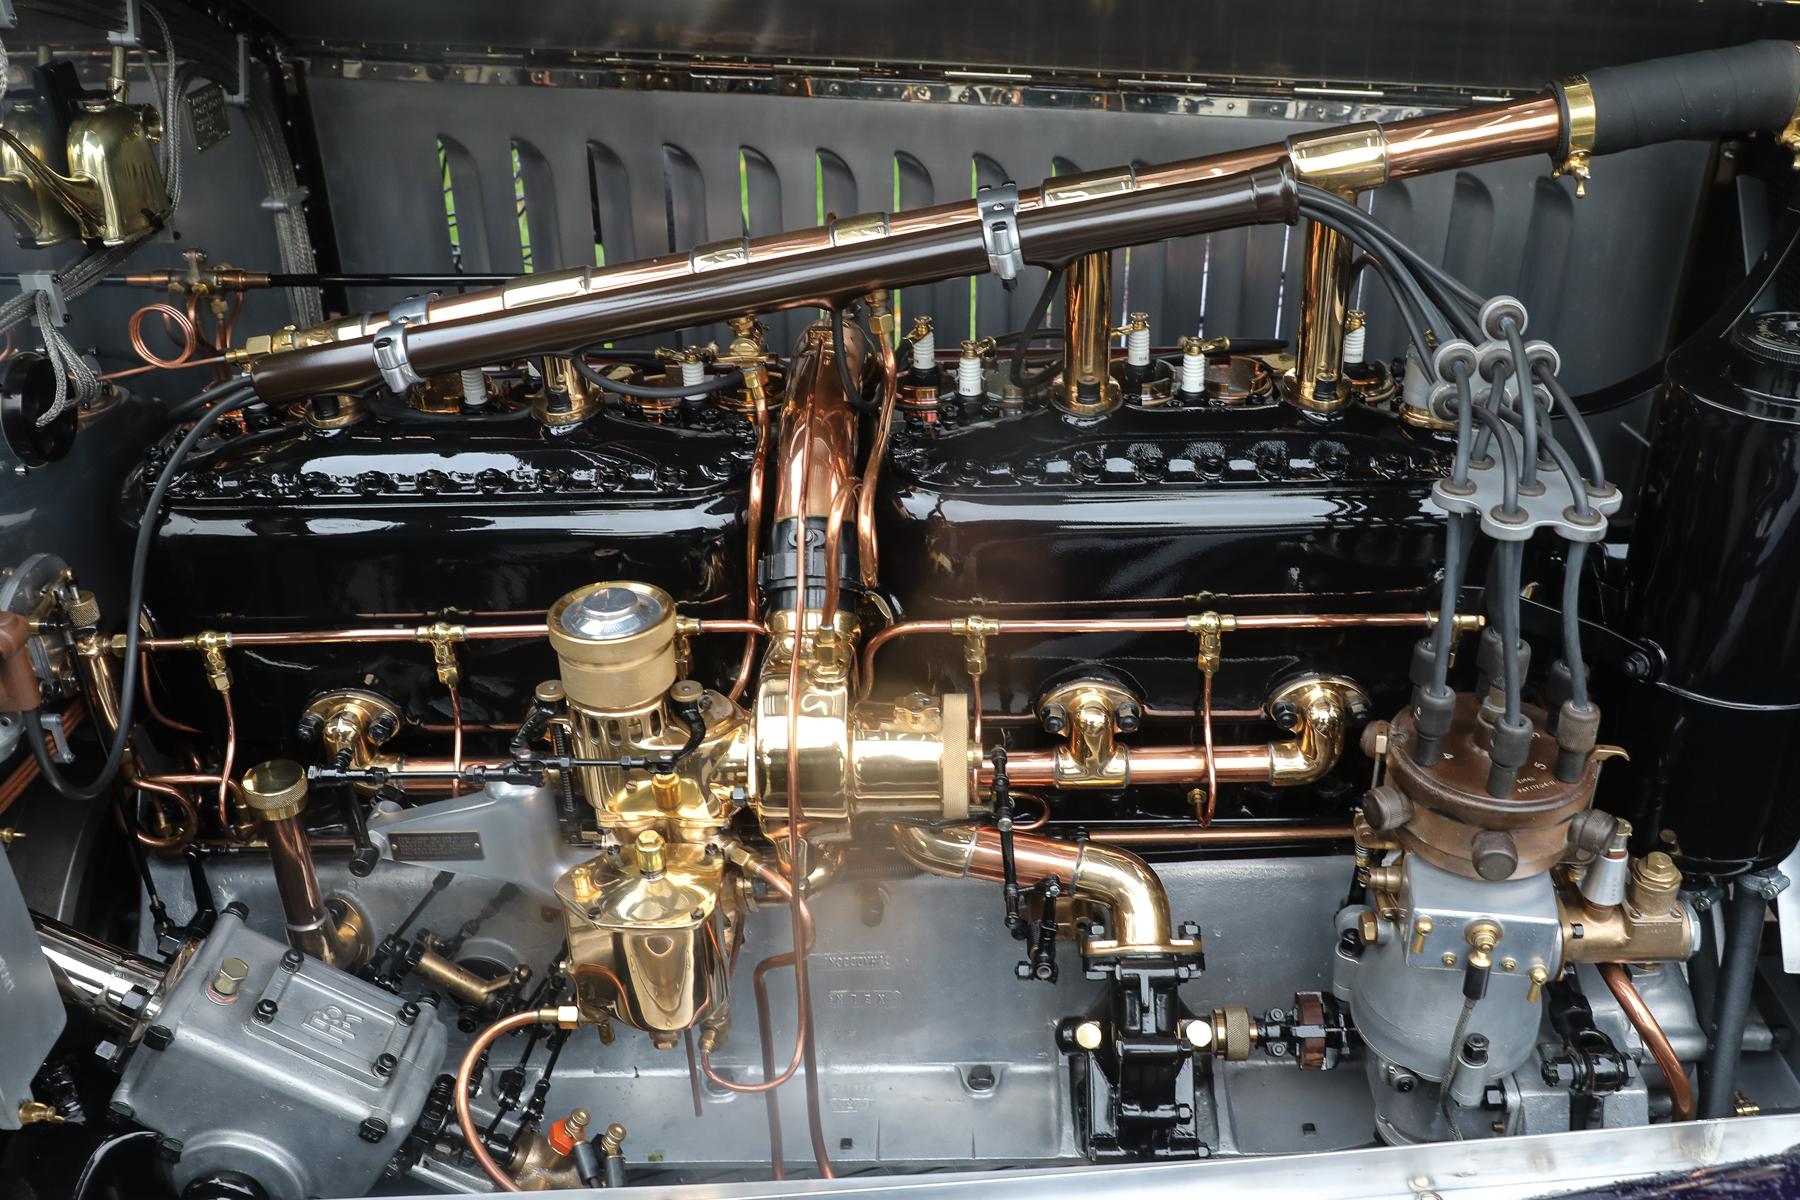 1919 Rolls Royce 40-50 HP Silver Ghost Alpine Eagle Tourer